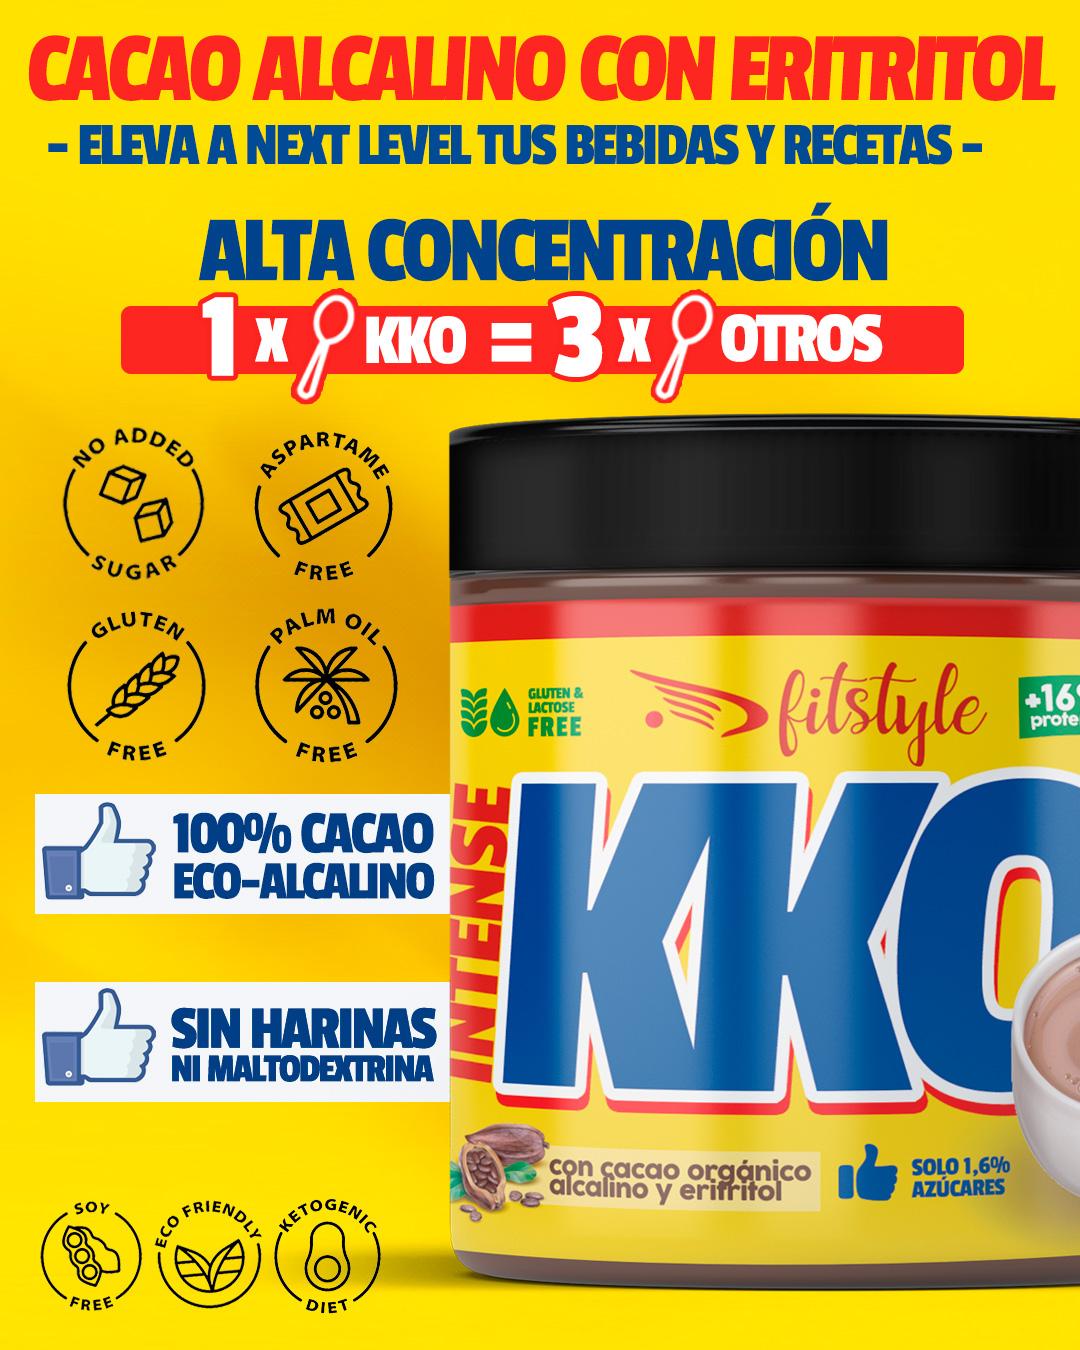 KKO Cacao ECO Alcalino 250g FITSTYLE